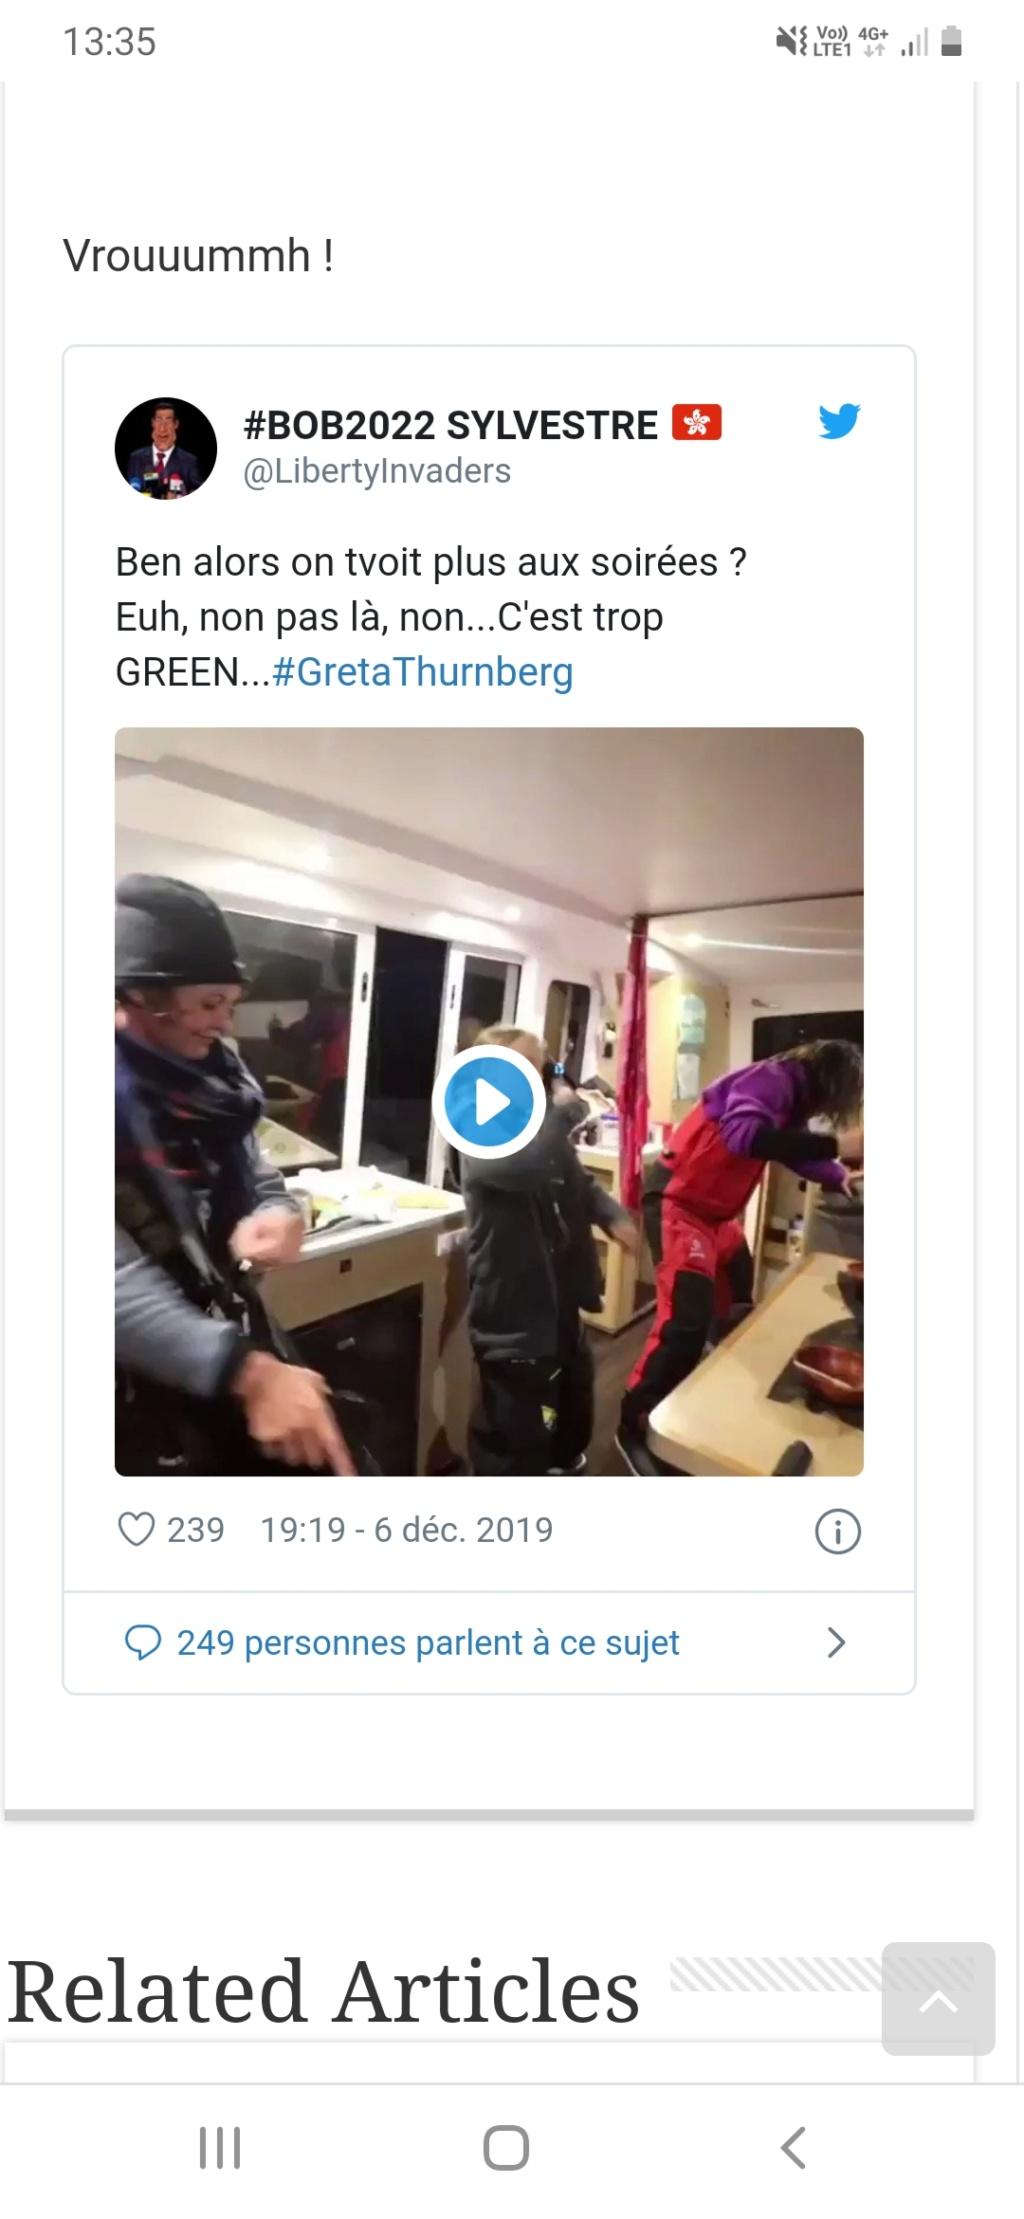 Greta Thunberg pourquoi tant de haine ? - Page 3 Screen36